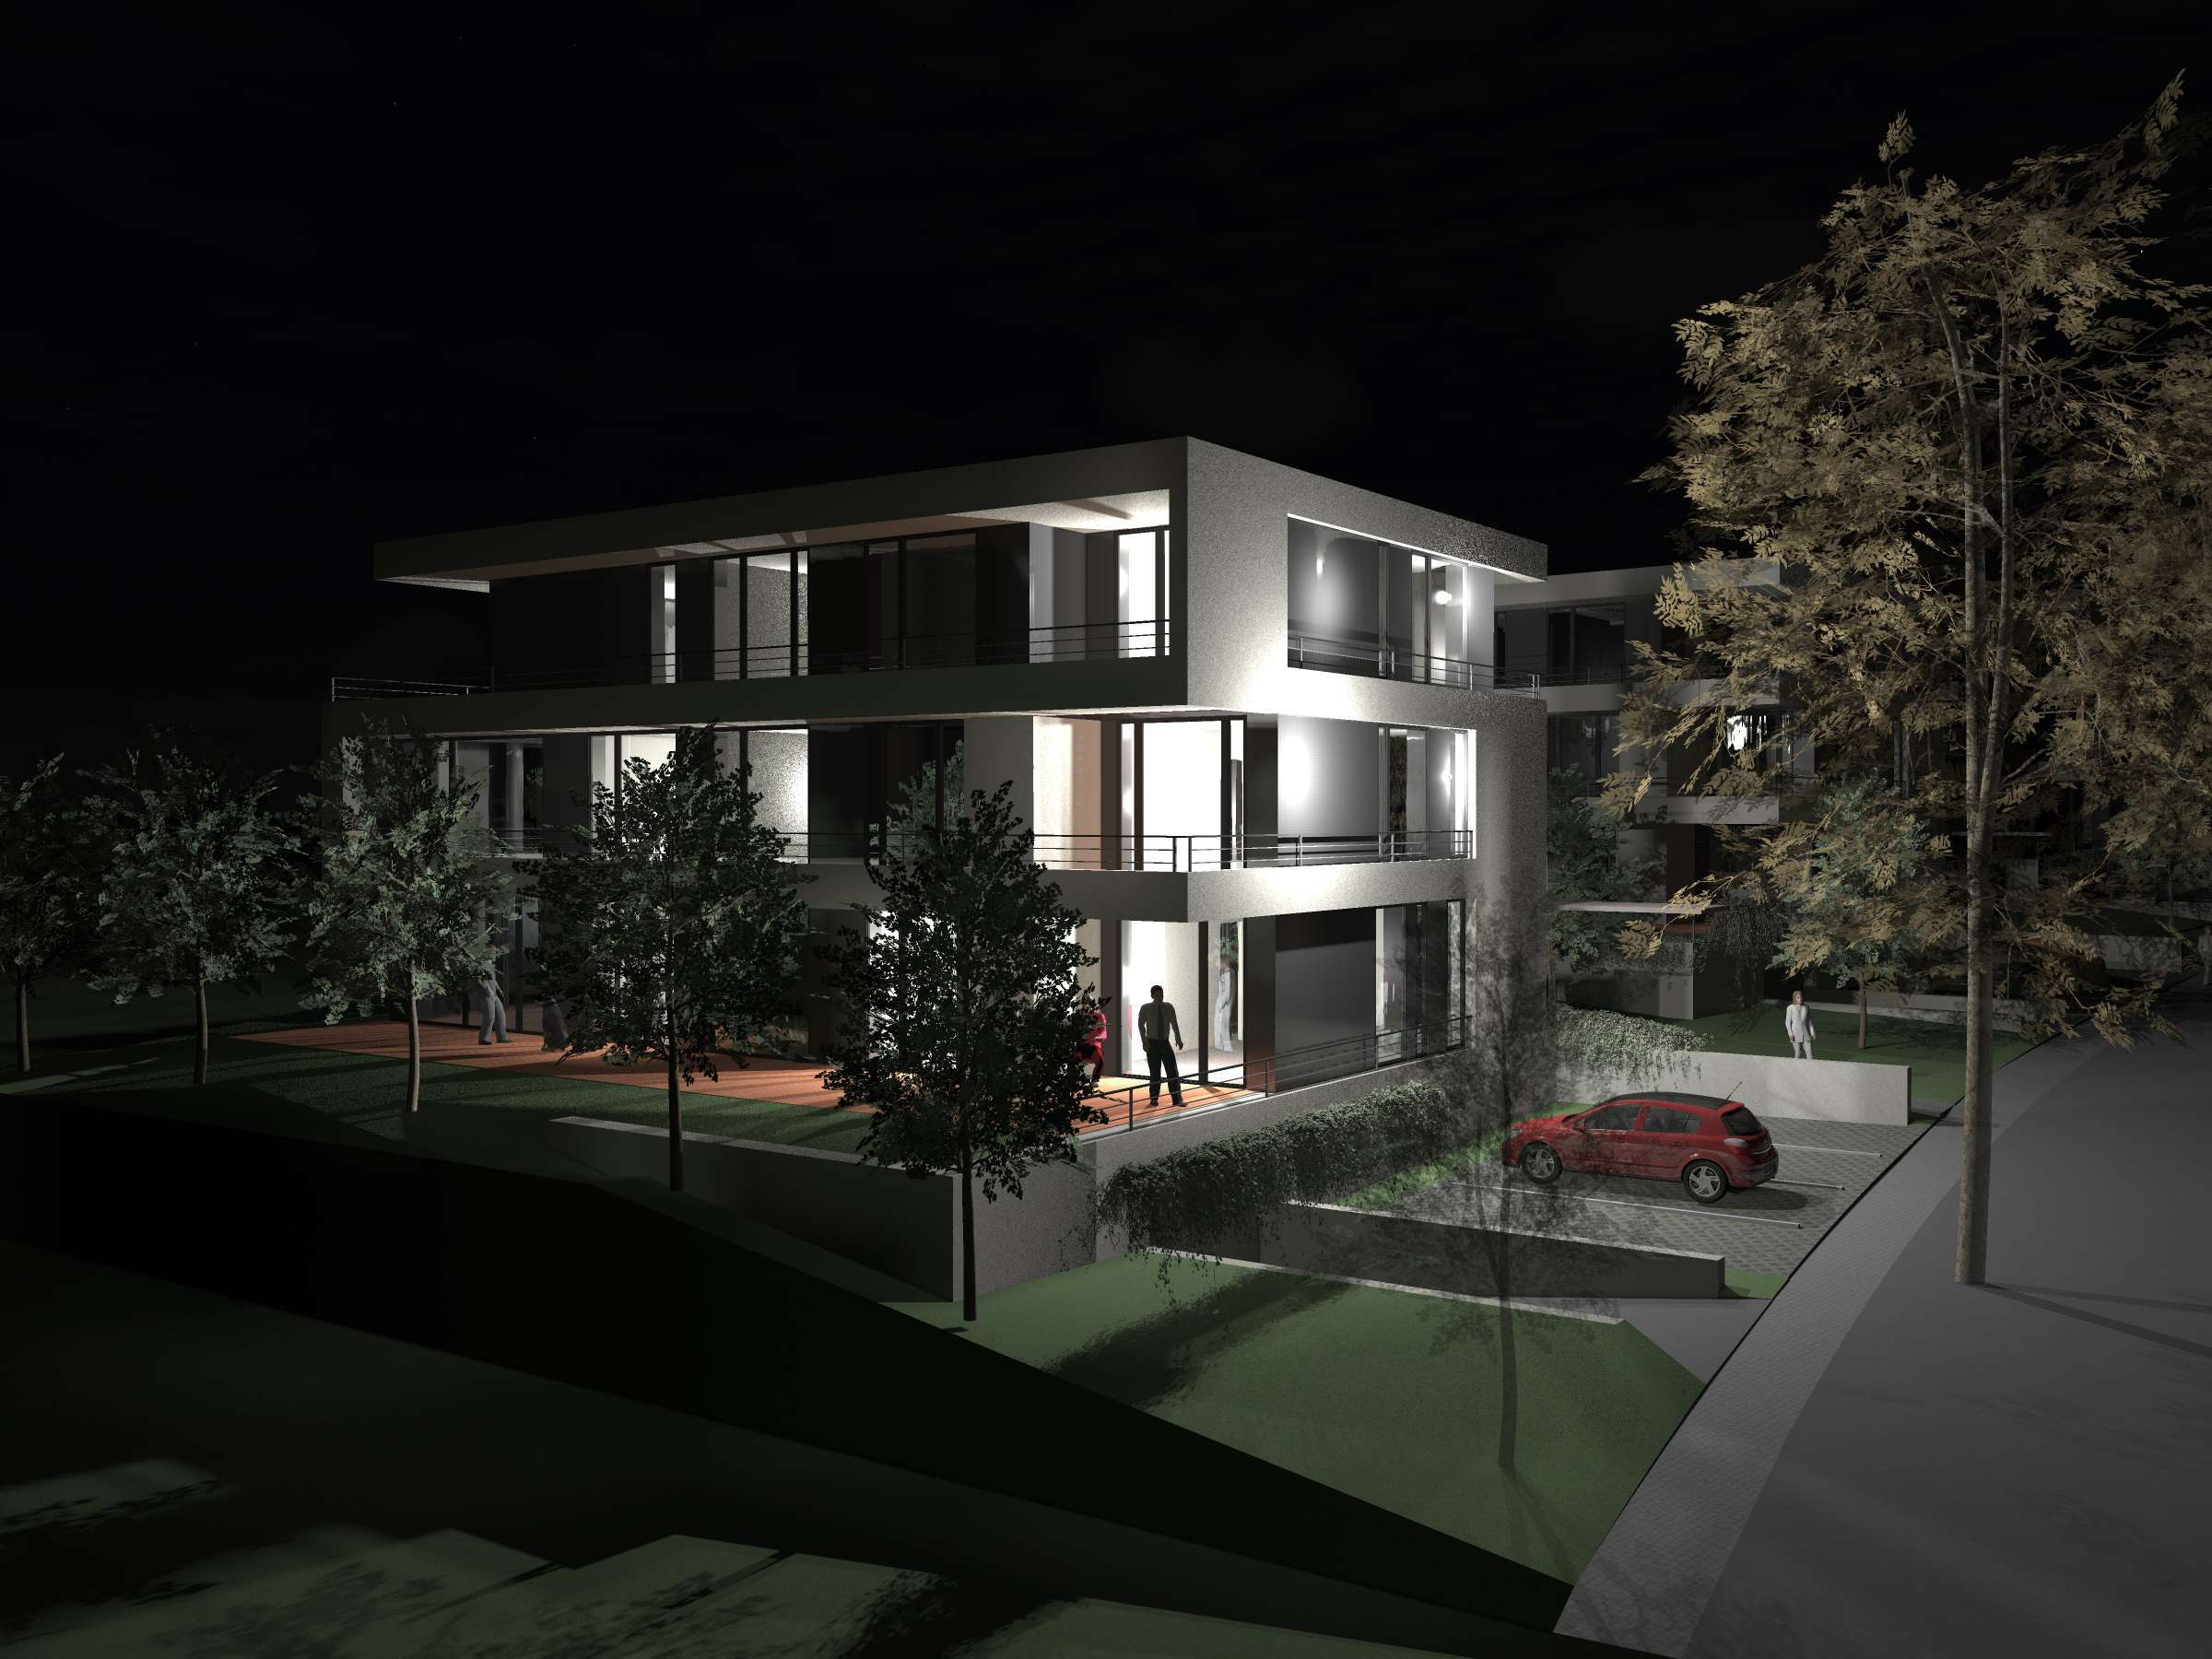 residential villa - Roztokyl - Prague - DA - 2012 01